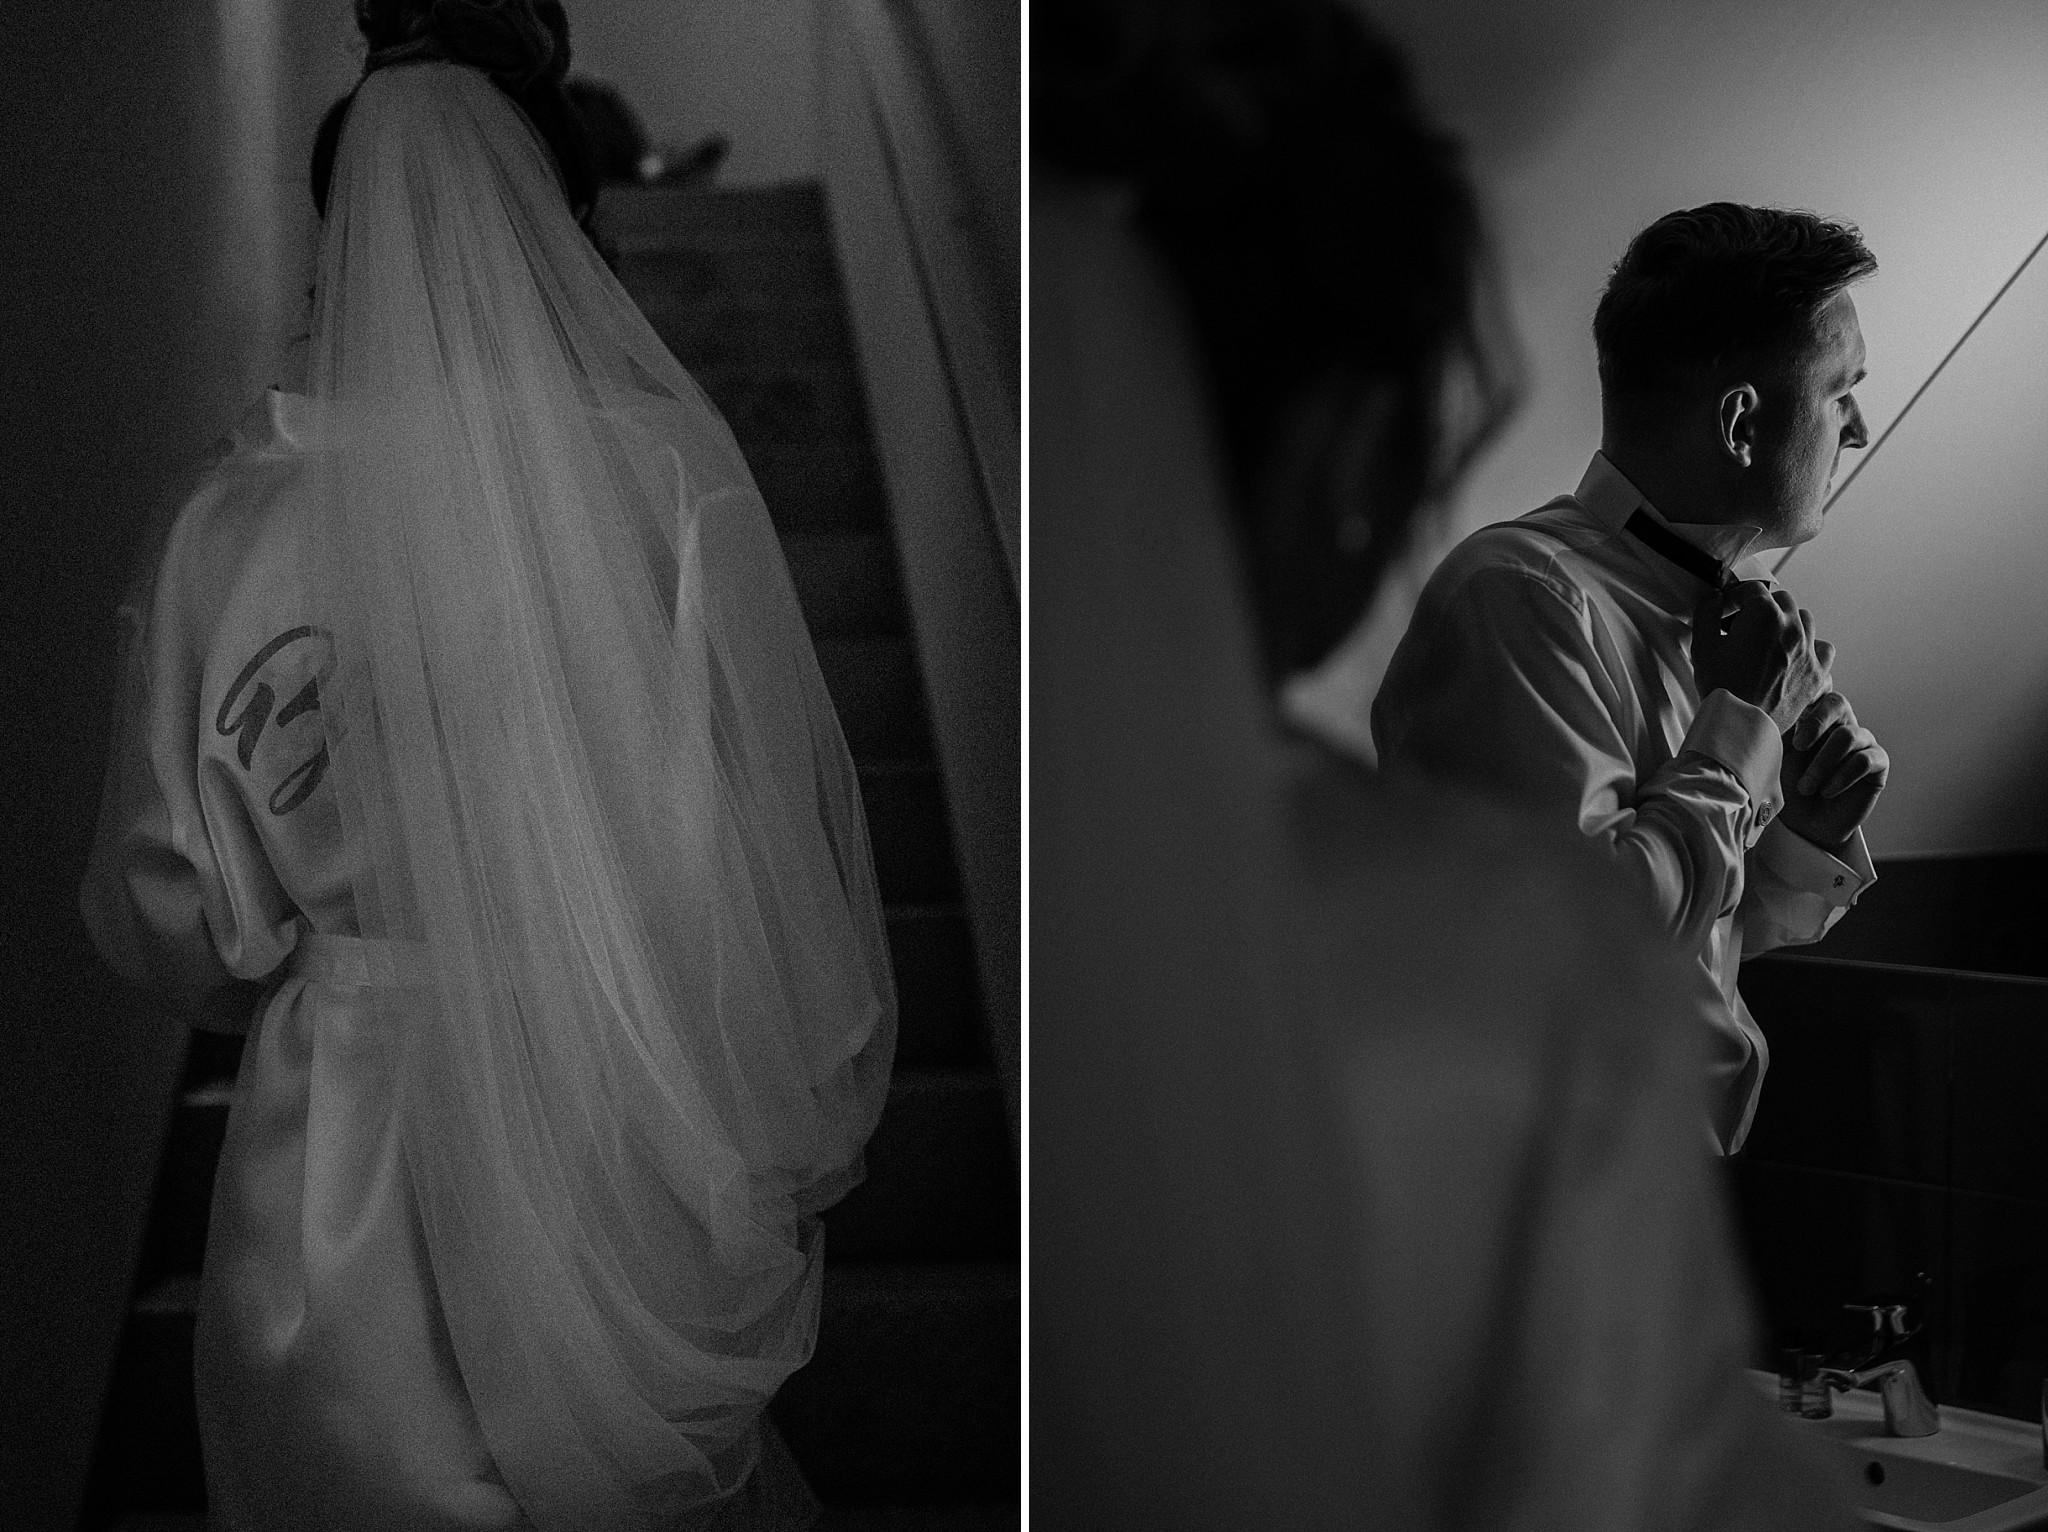 fotograf poznan wesele dobra truskawka piekne wesele pod poznaniem wesele w dobrej truskawce piekna para mloda slub marzen slub koronawirus slub listopad wesele koronawirus 033